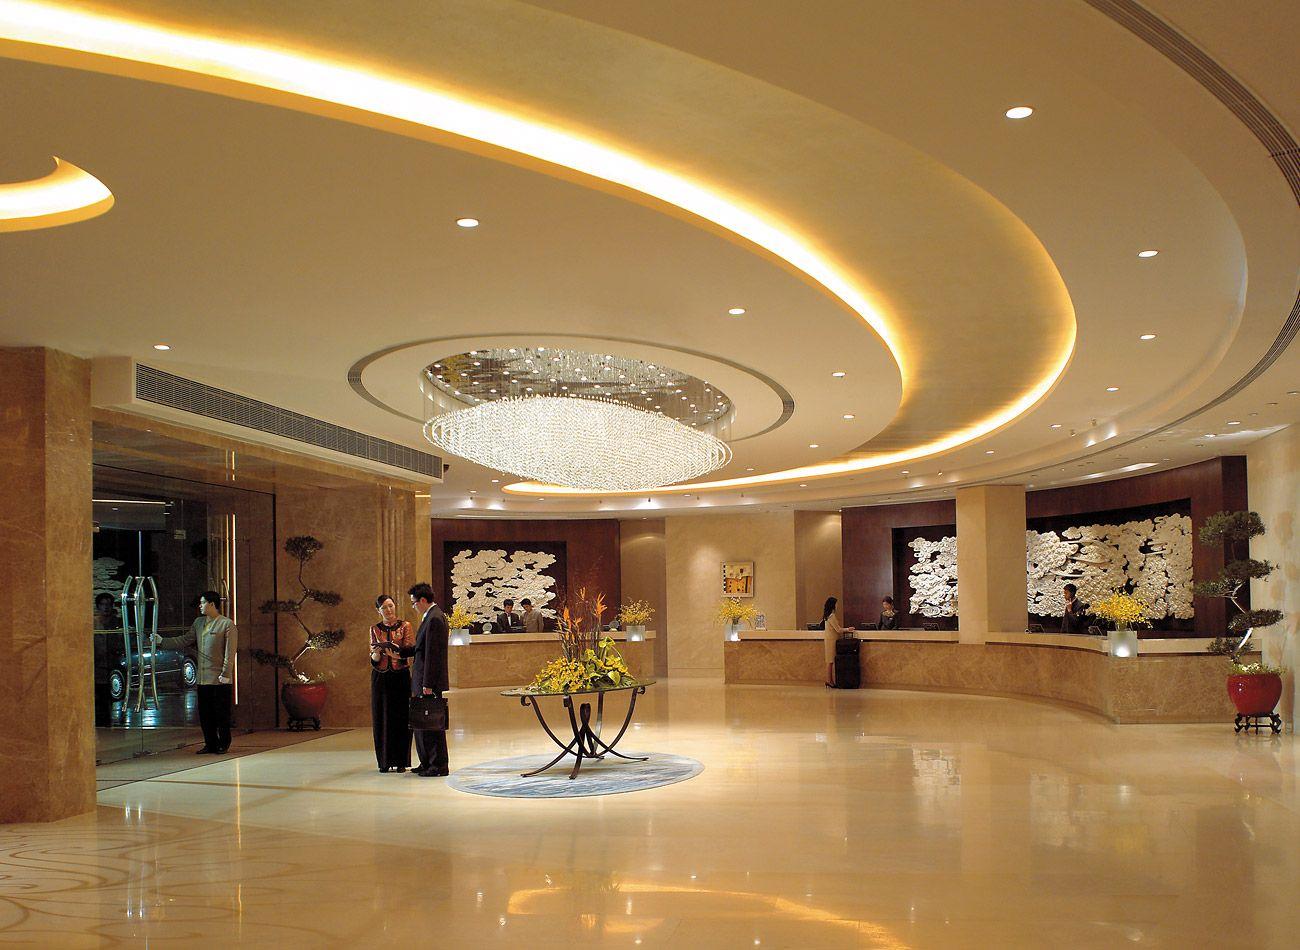 3d rendering luxury hotel lobby china luxury china hotel lobby - Lobby At 5 Star Hotel Shangri La Hotel Shenzhen This Hotel S Address Is East Side Railway Station Jianshe Road Luohu Railway Station Shenzhen 518001